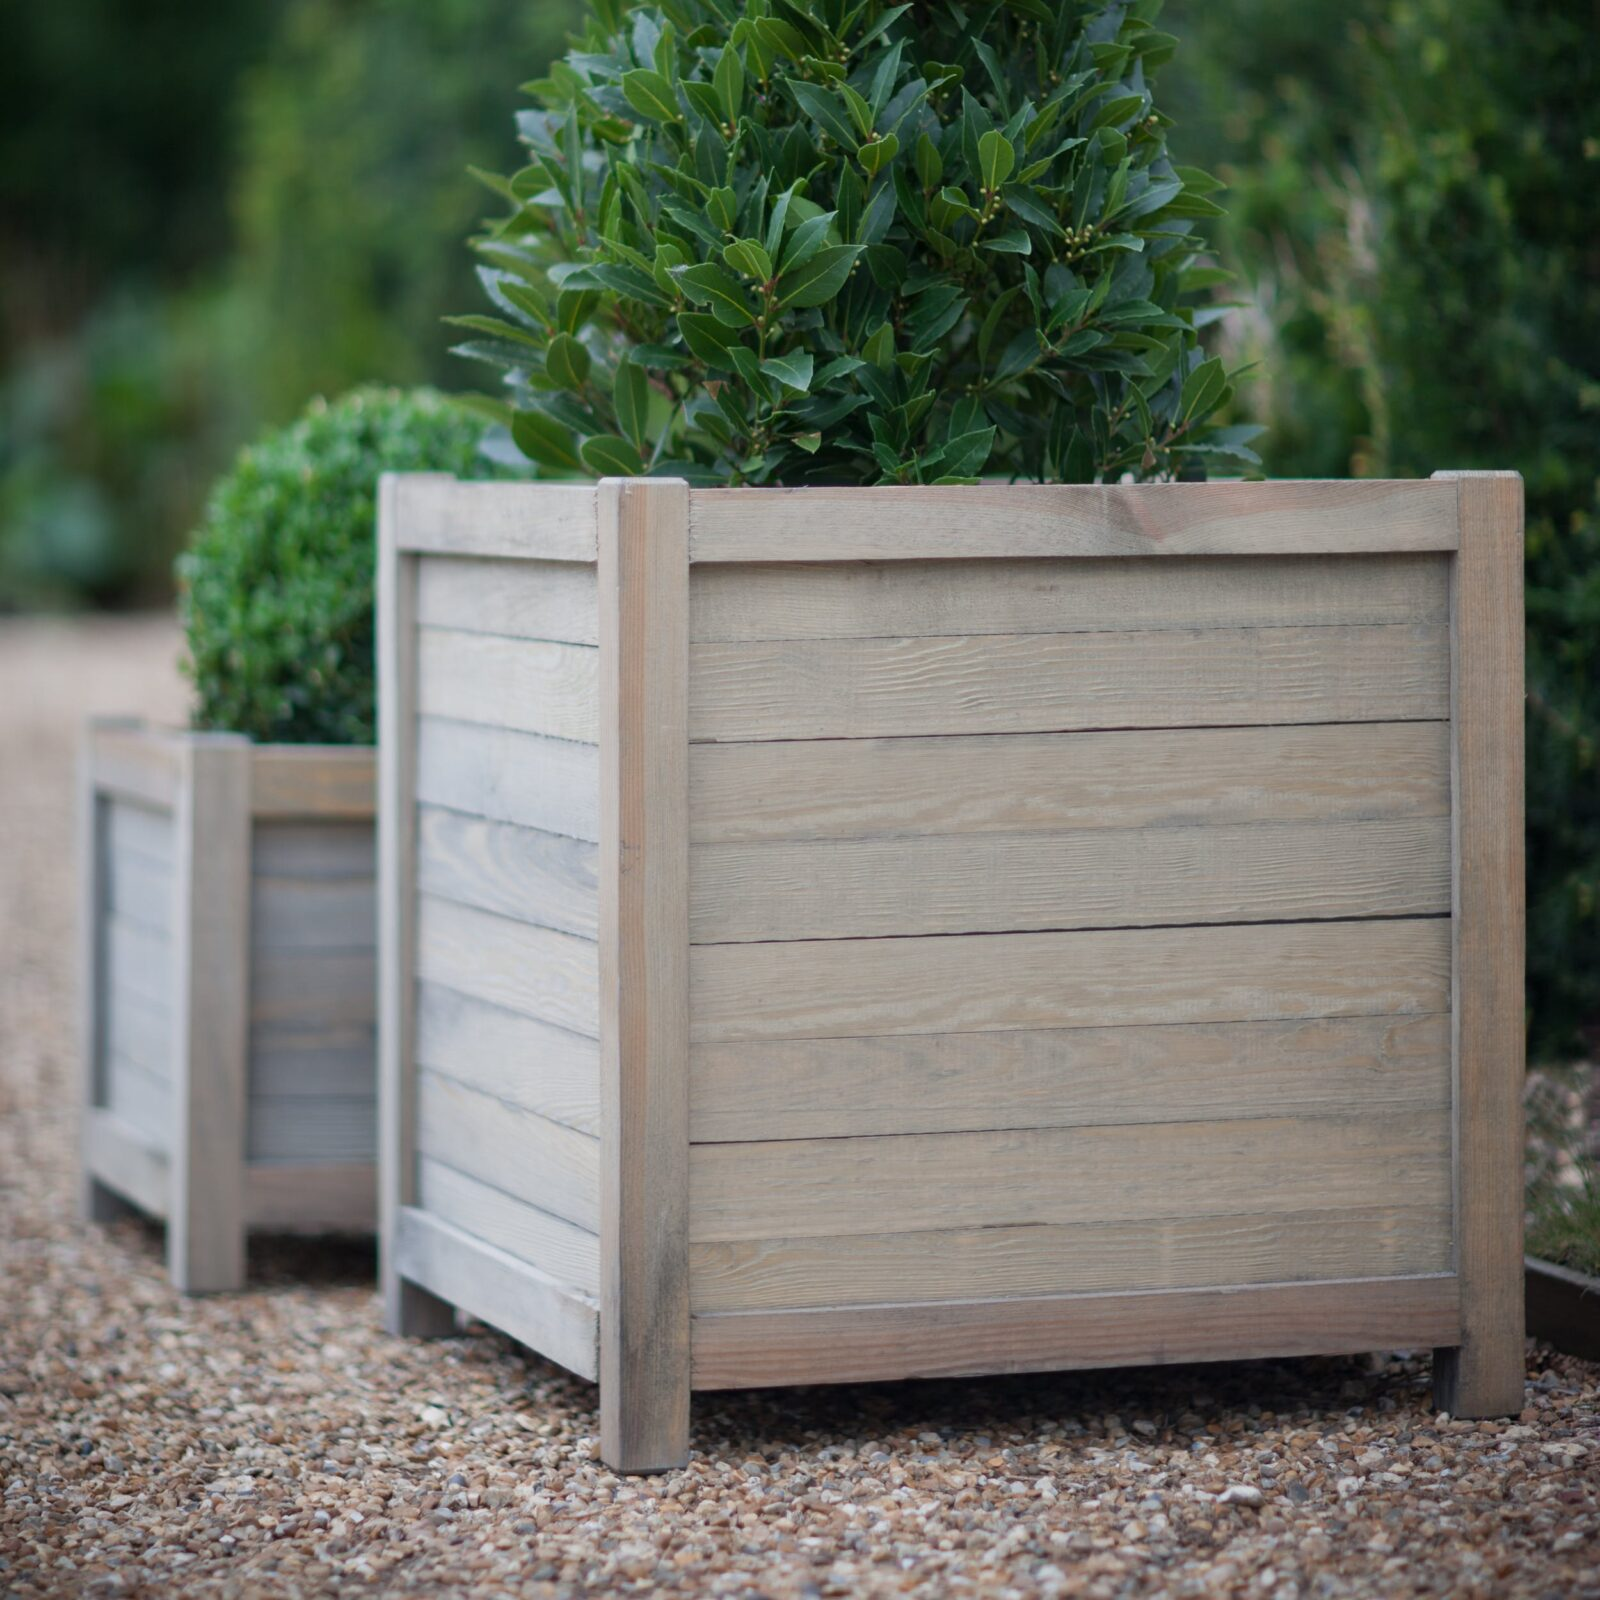 60cm Planter - Spruce